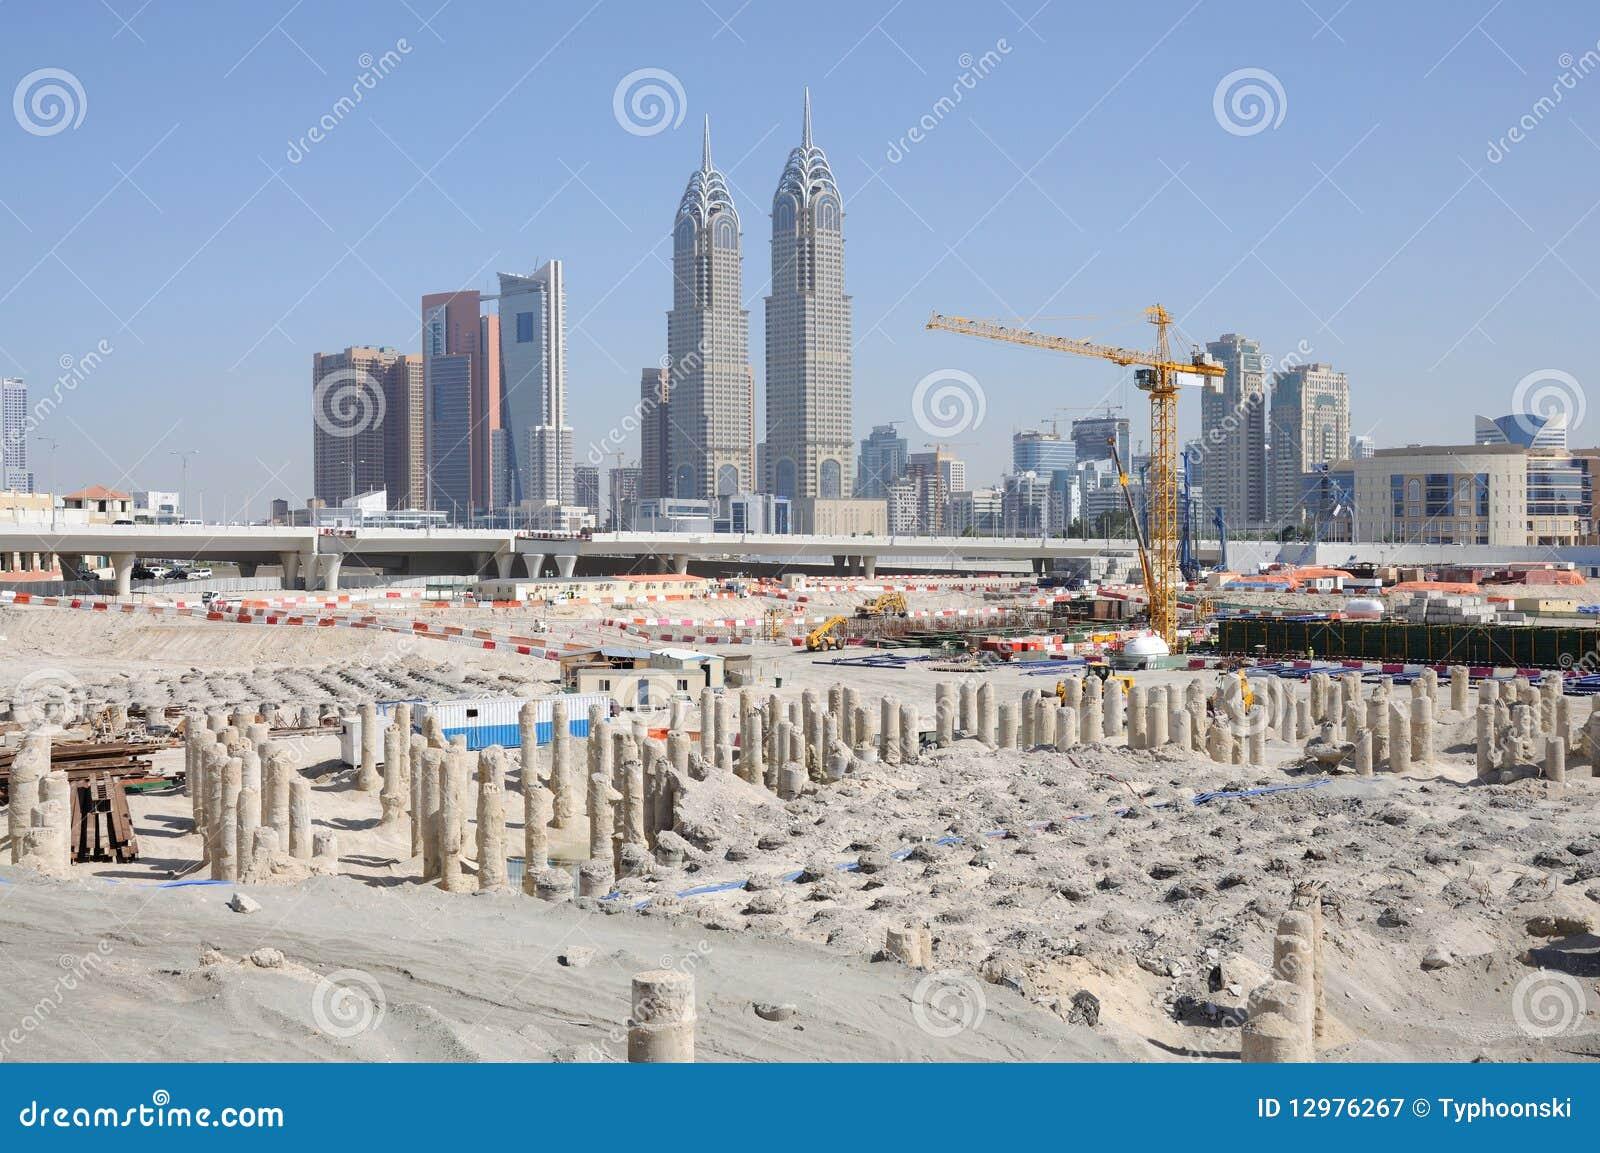 Dubai dating sites free